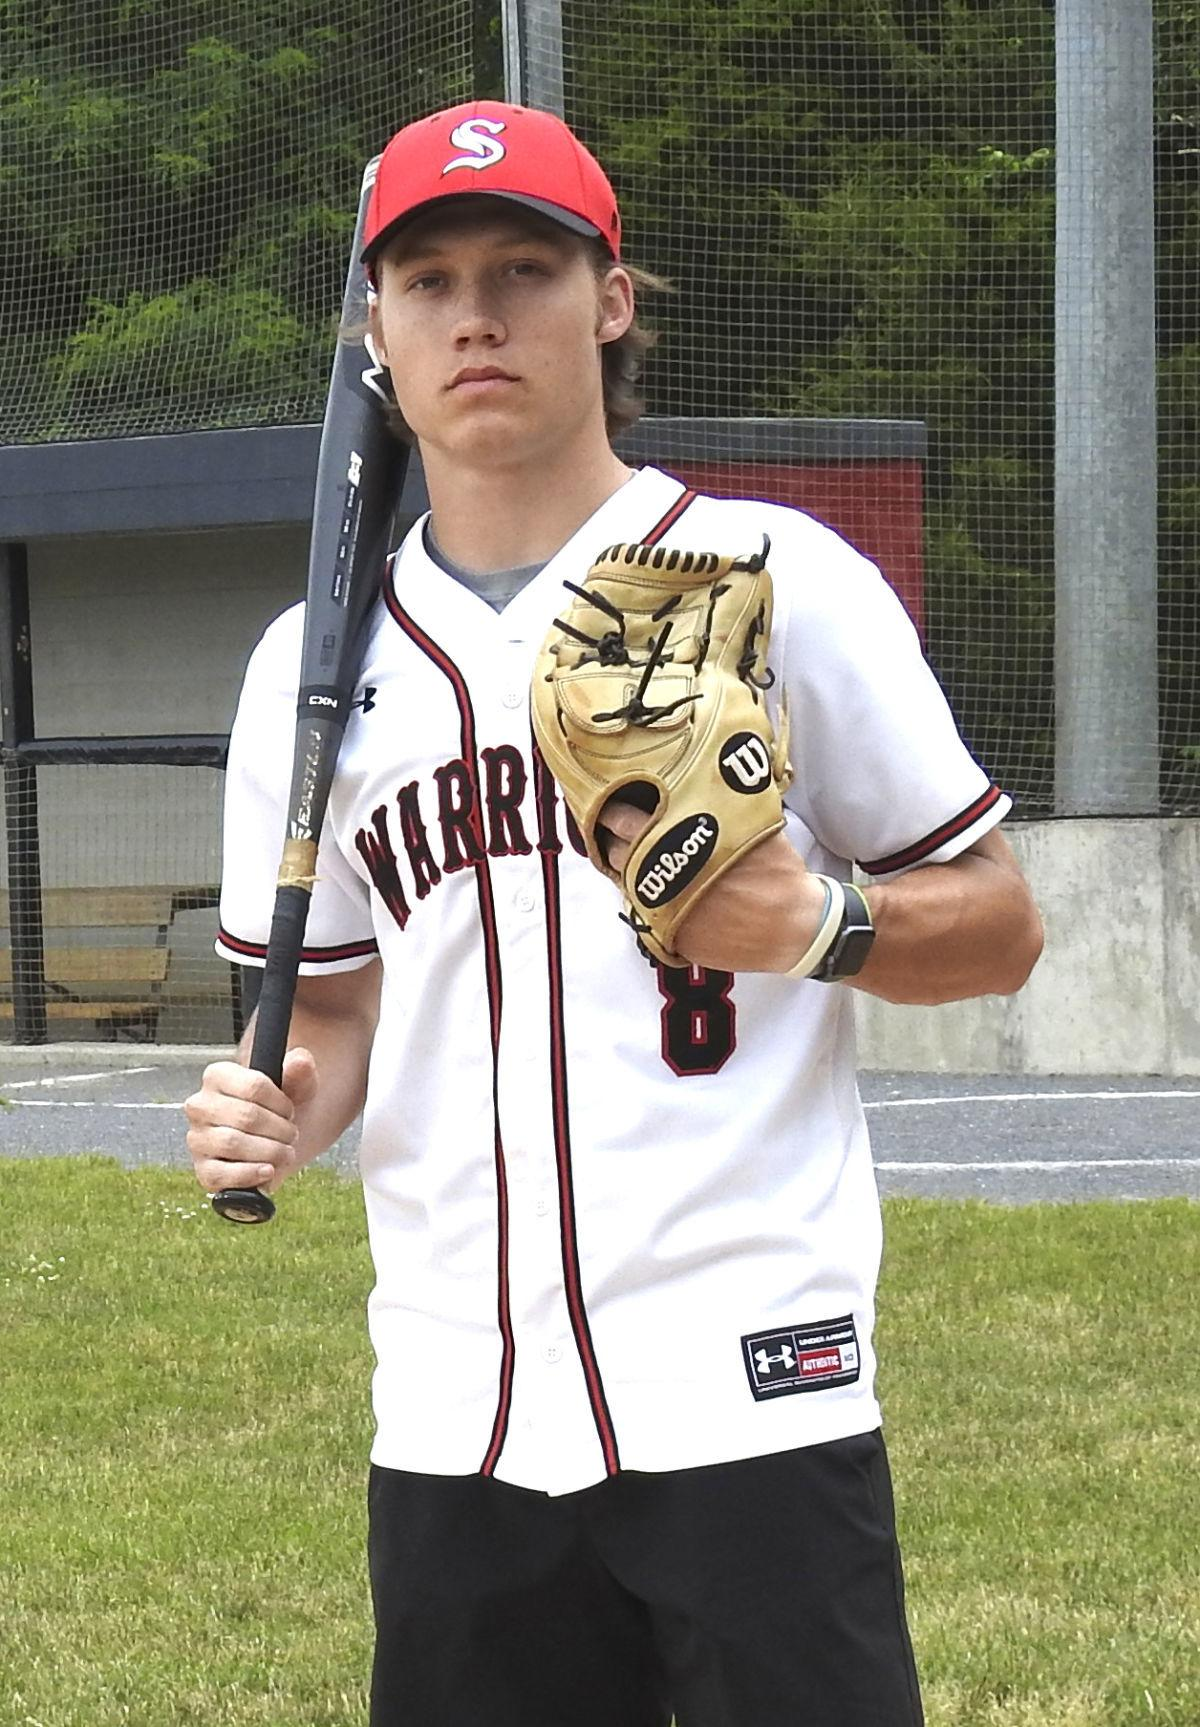 Baseball Player of the Year: Sherando's Hunter Entsminger